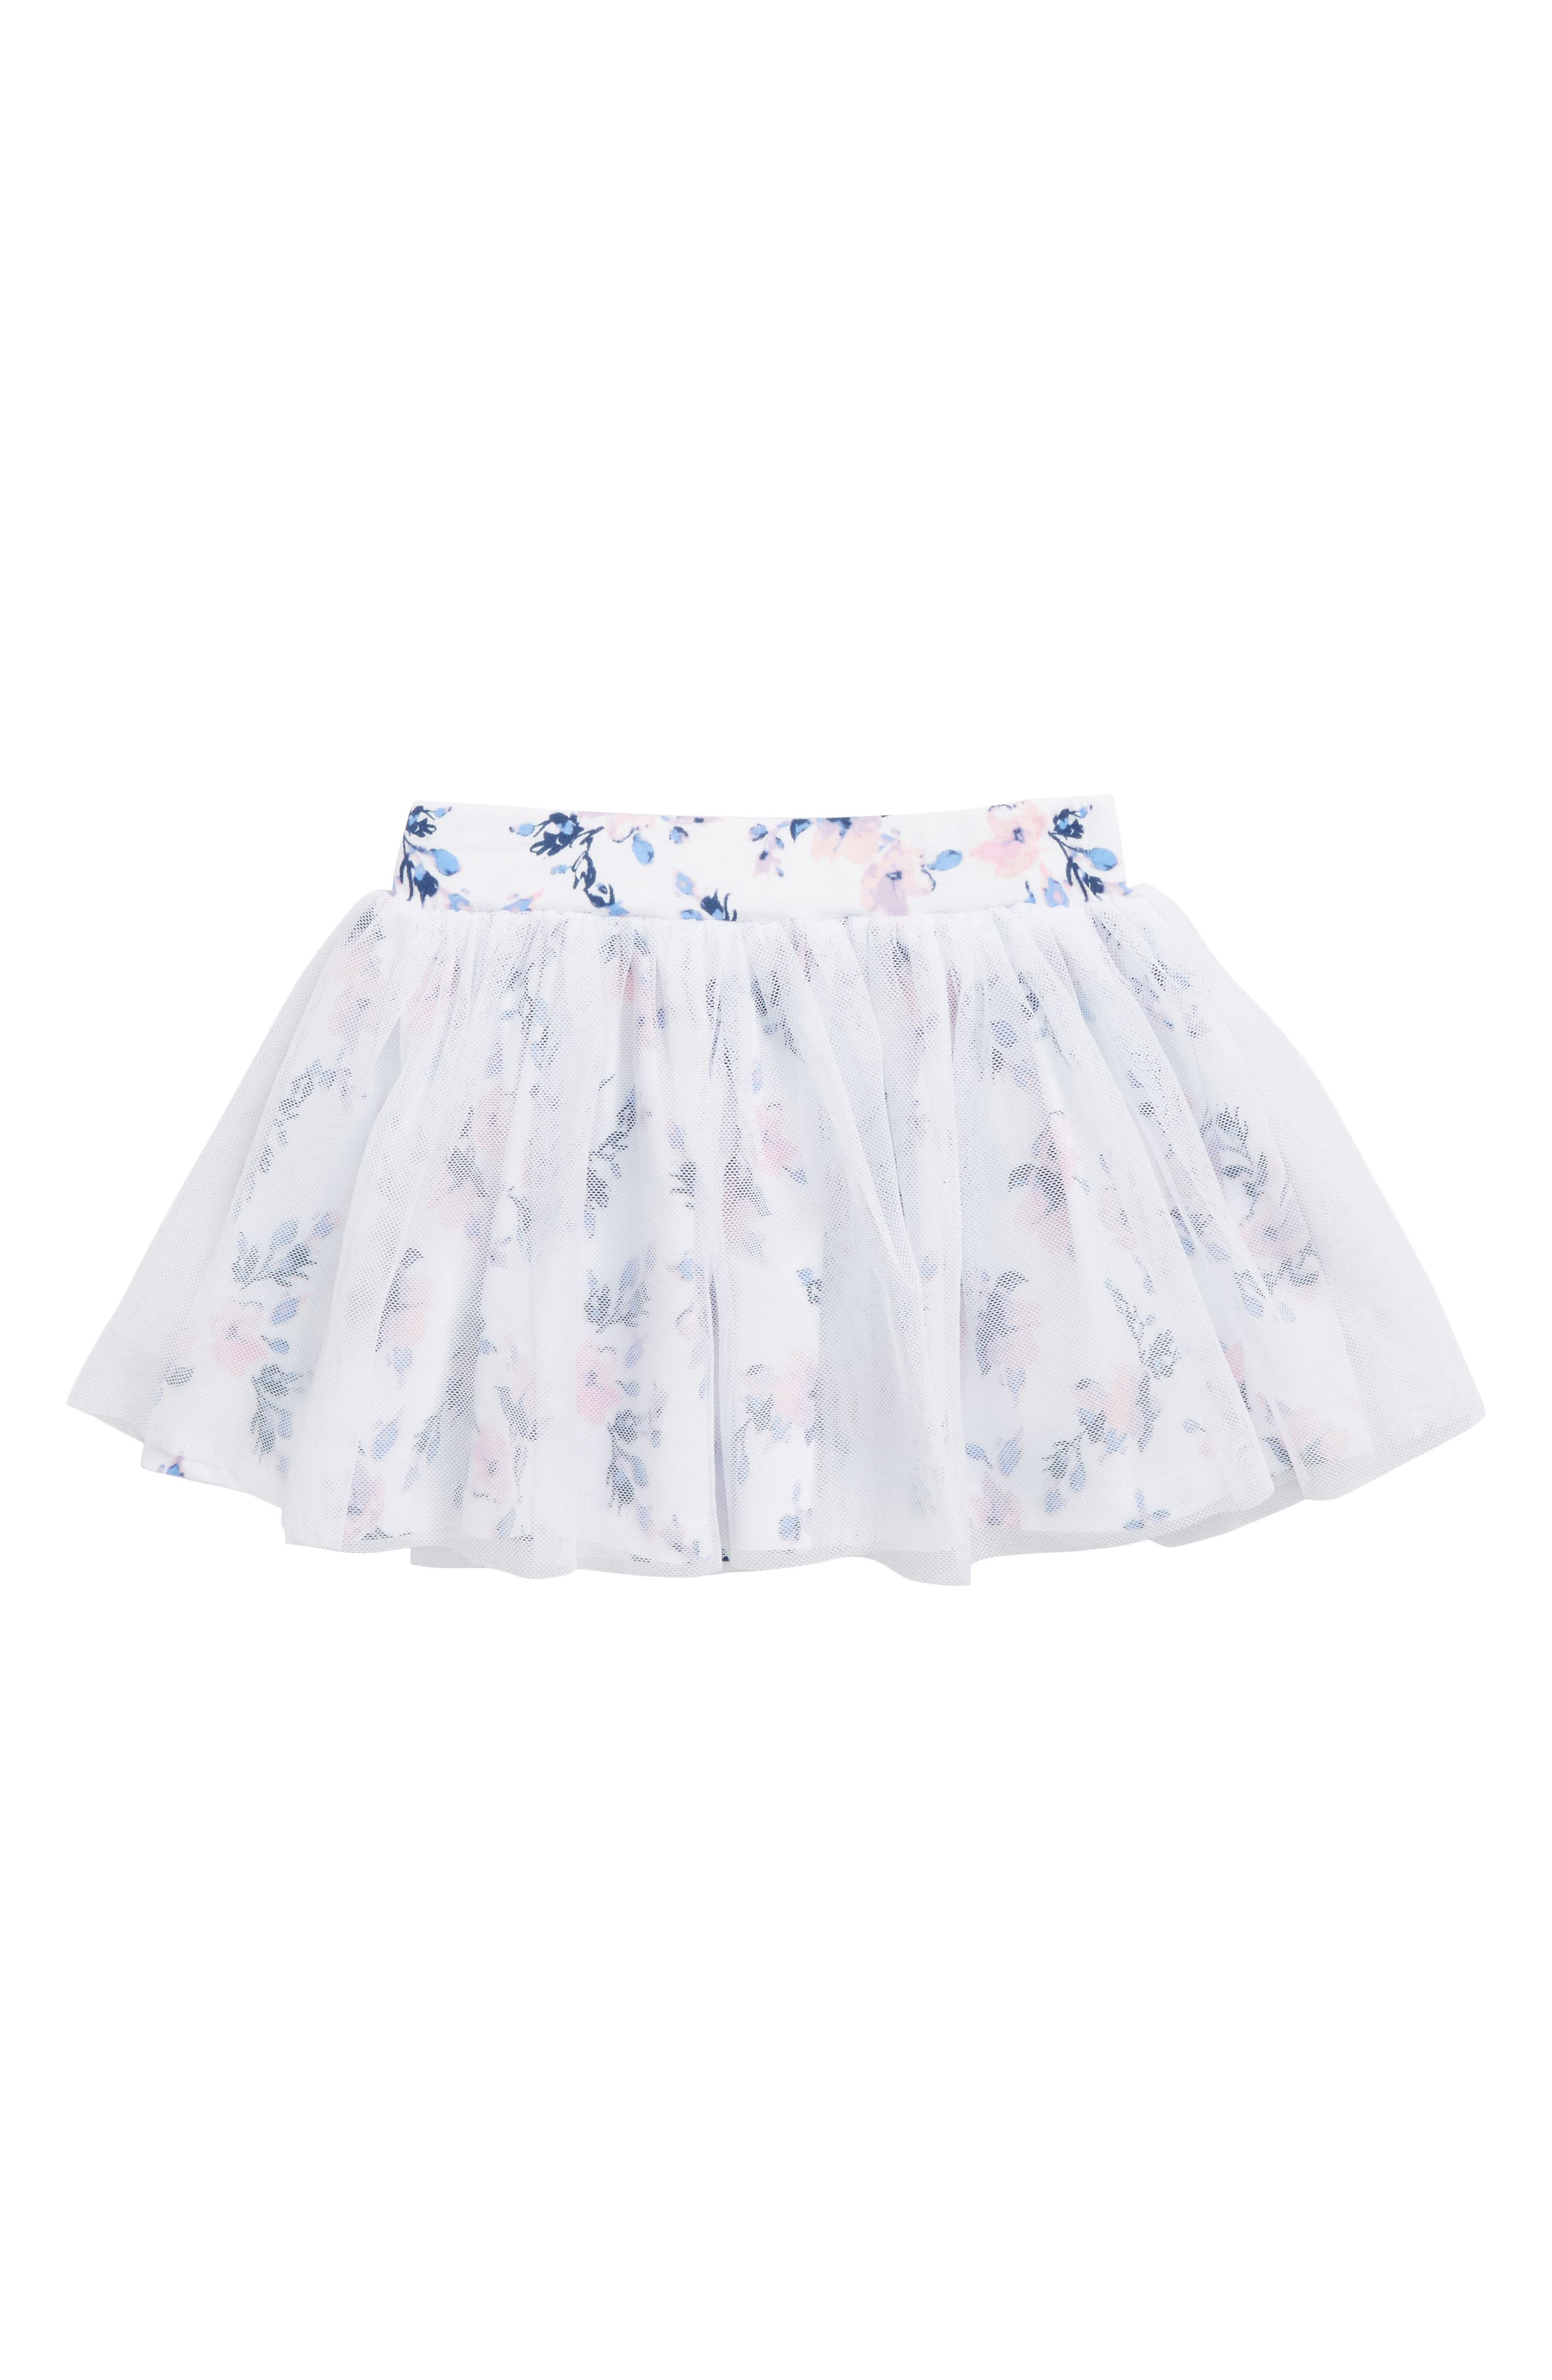 Flower Print Tutu Skirt,                             Main thumbnail 1, color,                             100